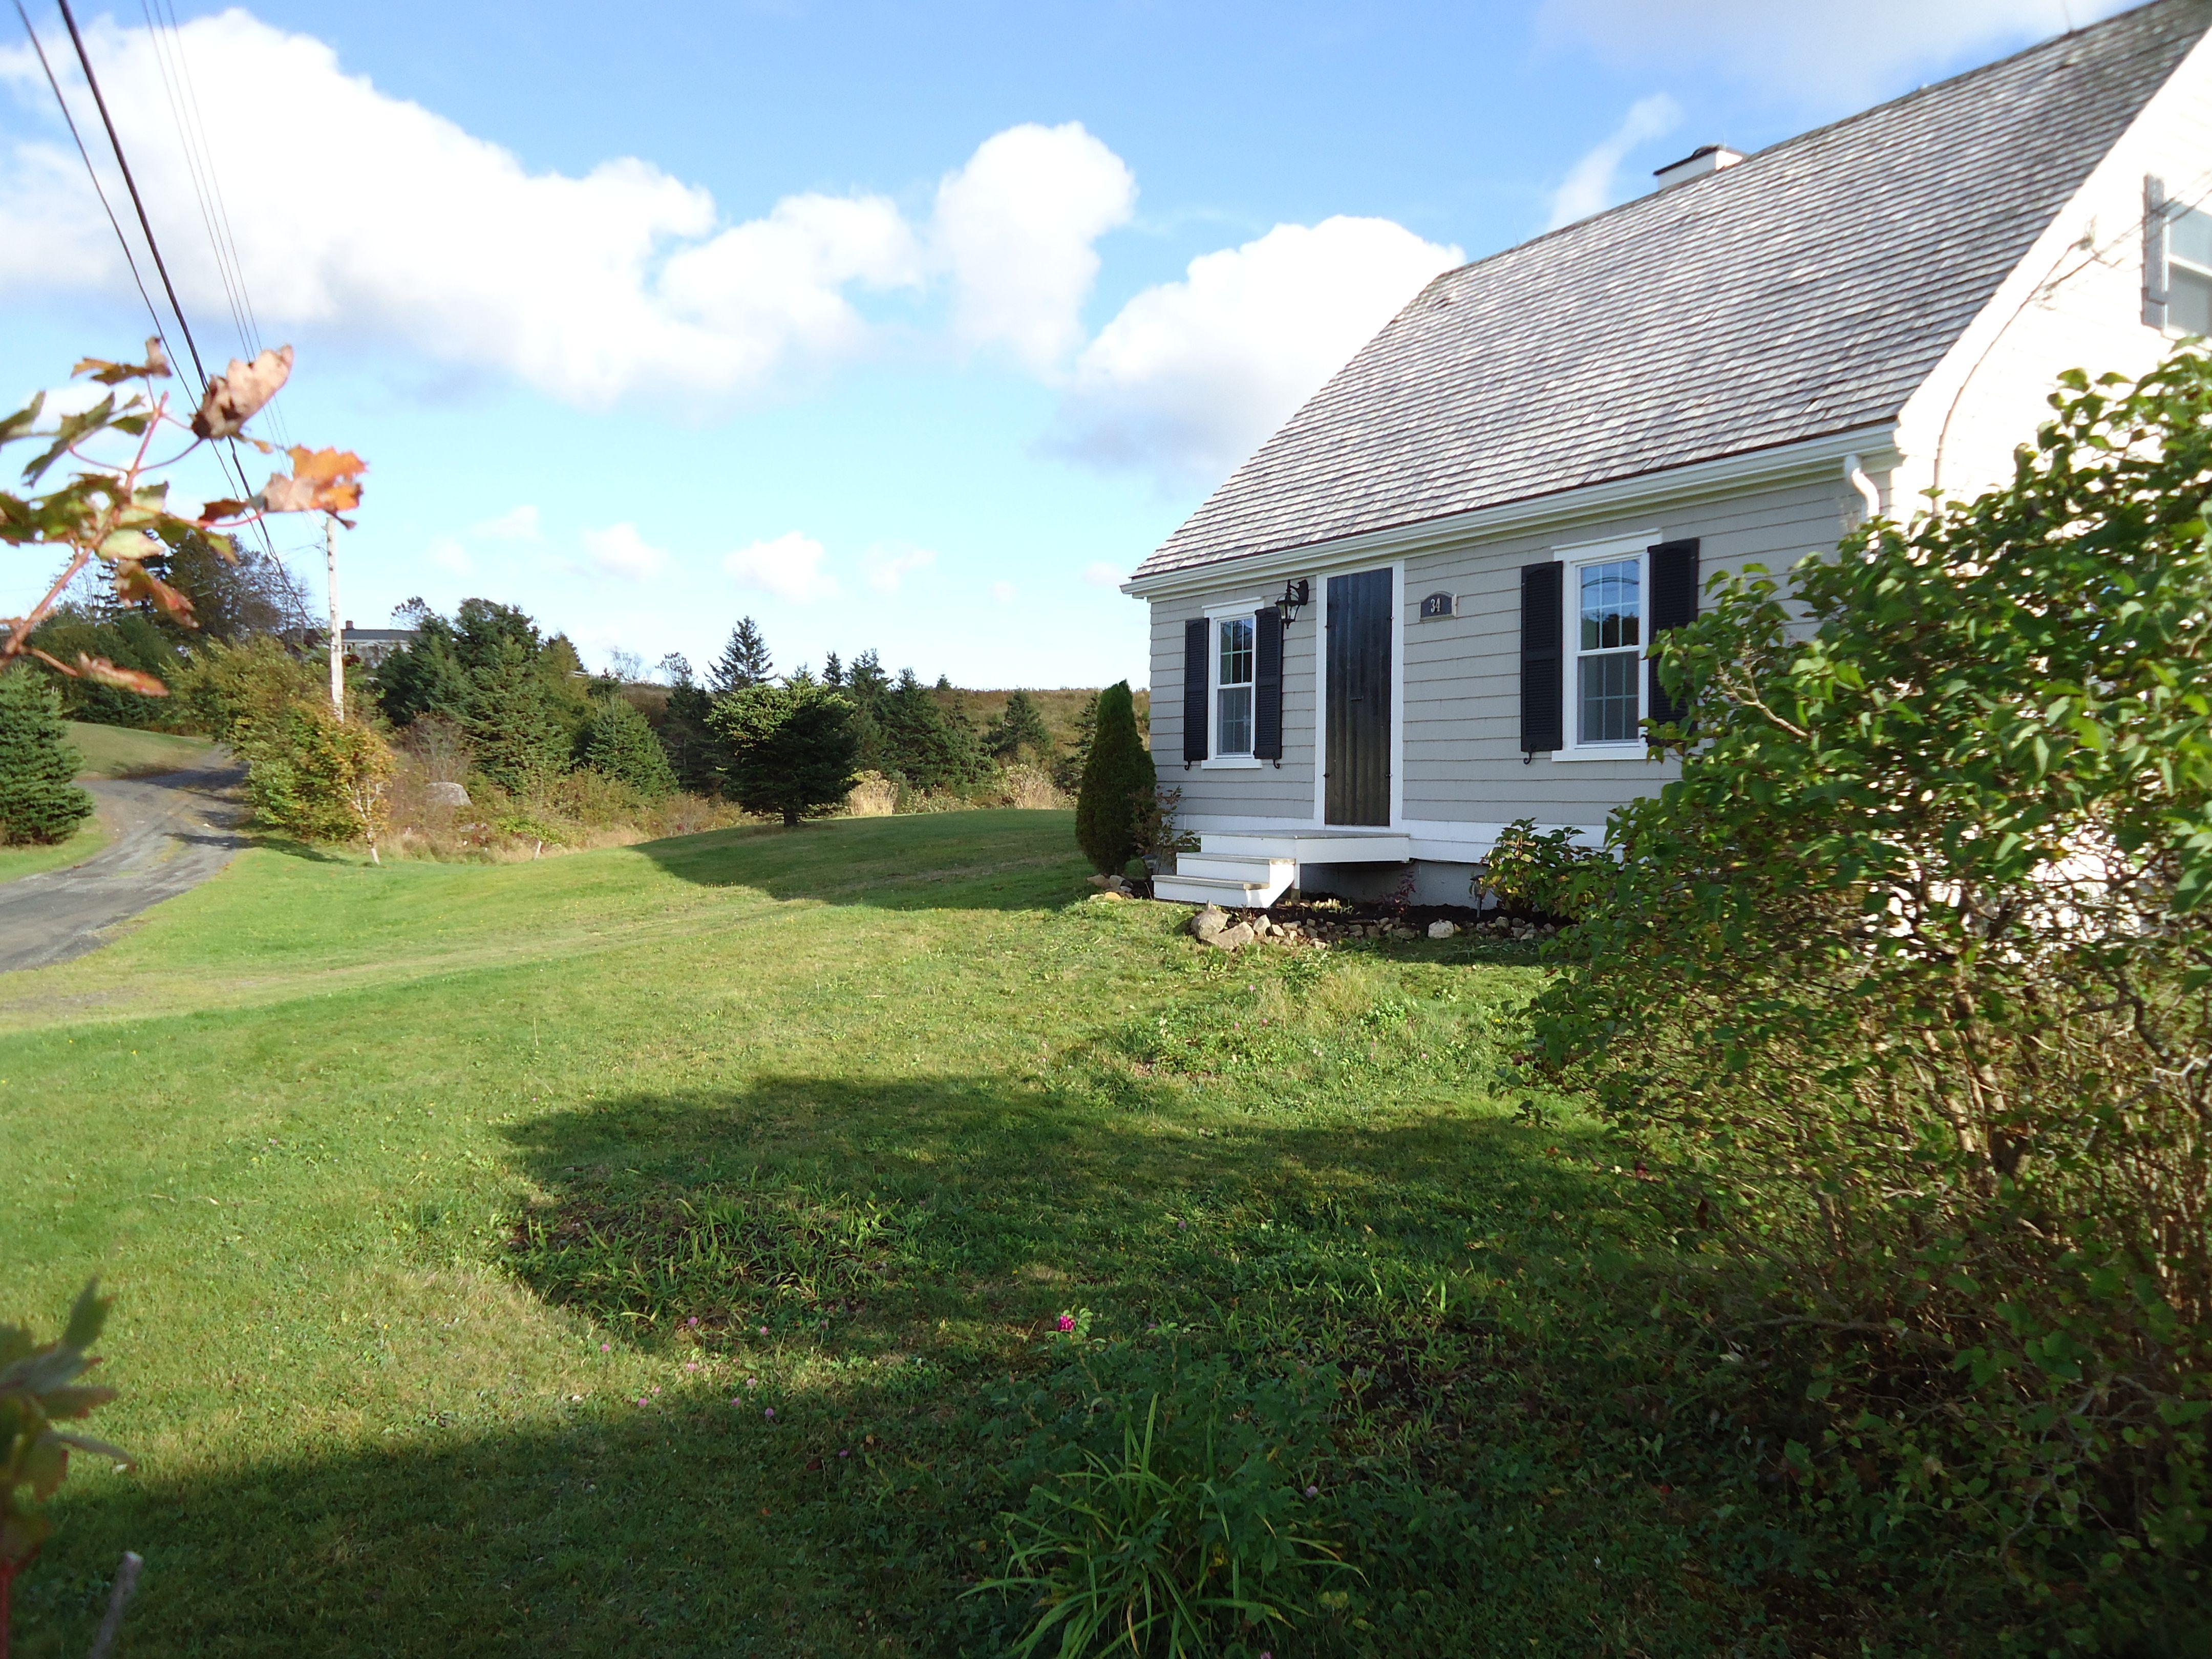 Pleasant Halifax Nova Scotia Vacation Rental Cedar Shingled 1800S Interior Design Ideas Apansoteloinfo